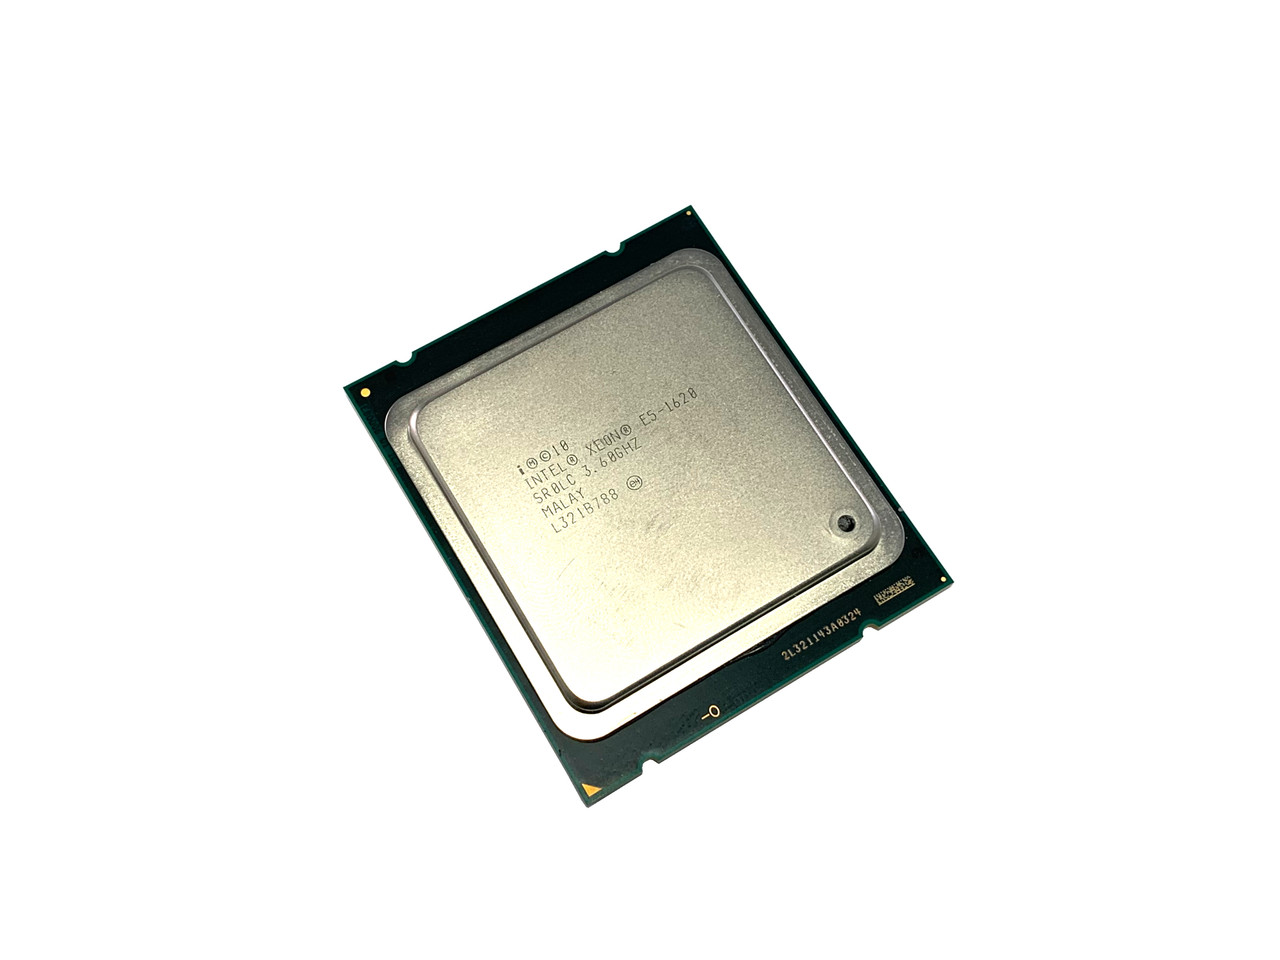 10Mb sr0lc intel xeon e5-1620 quad core 3.60ghz 10mb processor chip